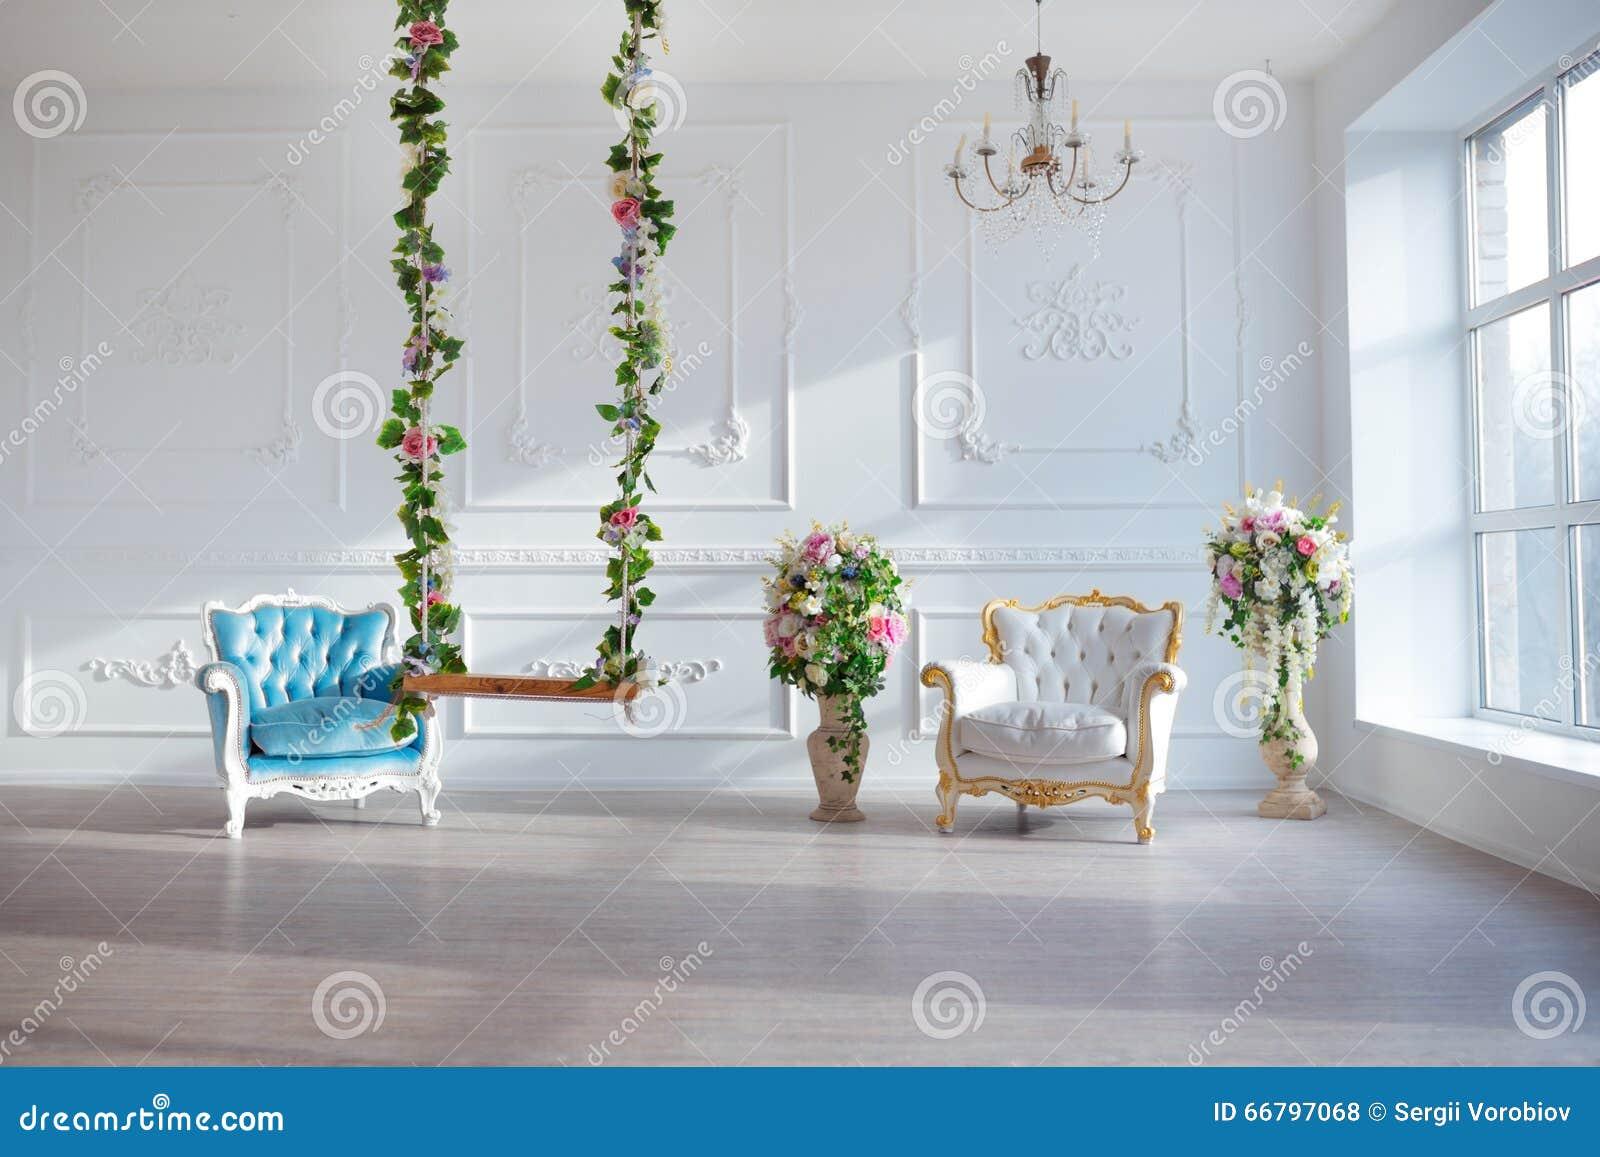 Vintage window interior design royalty free stock photo for Designs east florist interior